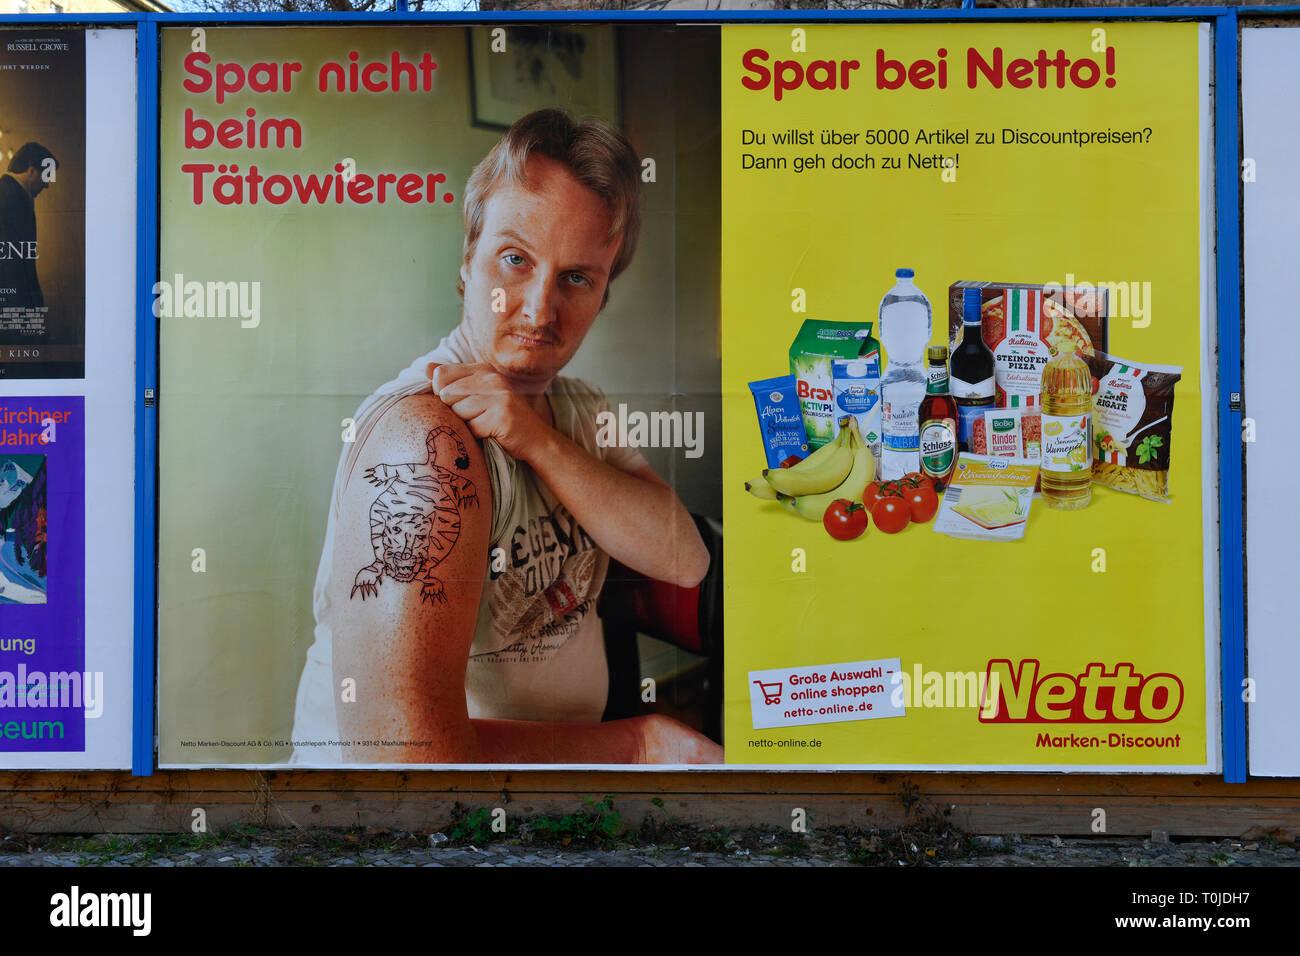 Netto Markt High Resolution Stock Photography